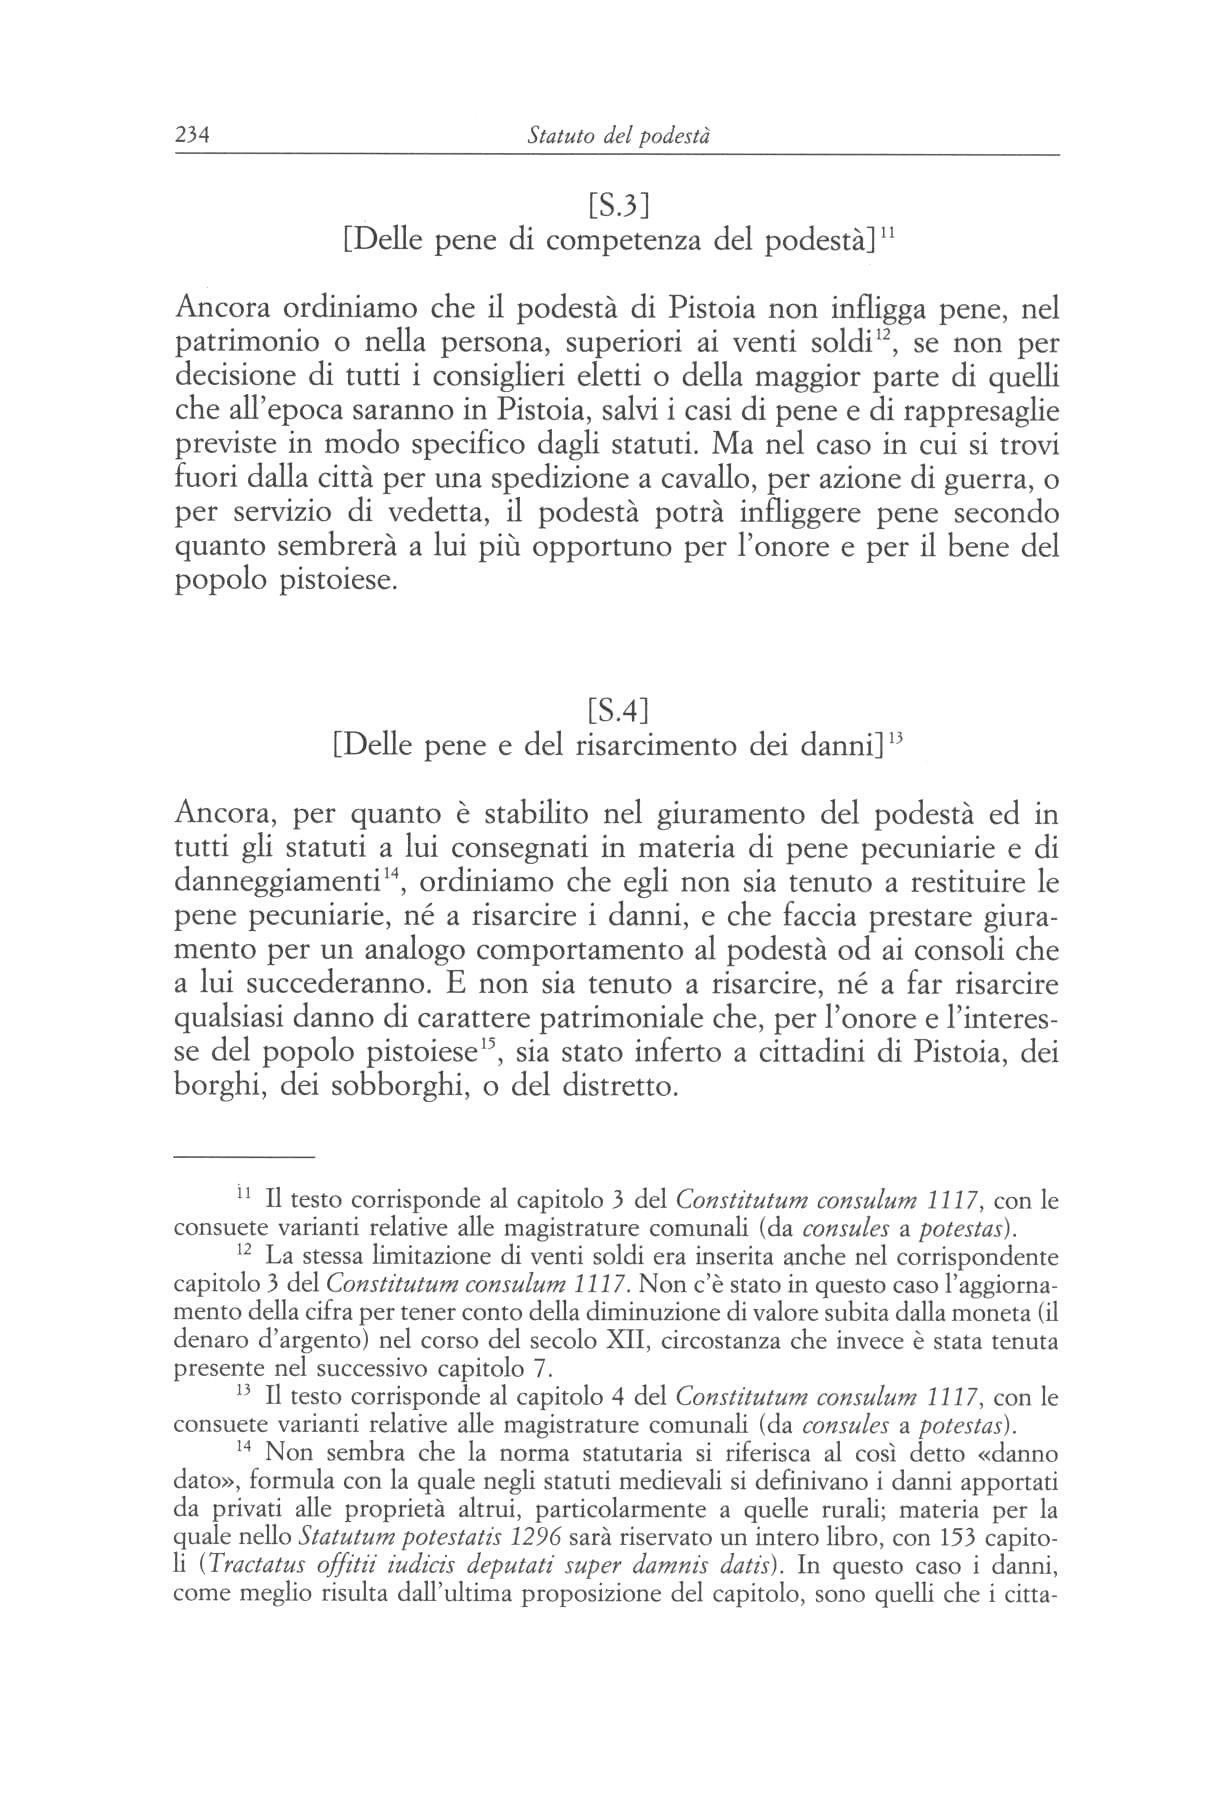 statuti pistoiesi del sec.XII 0234.jpg